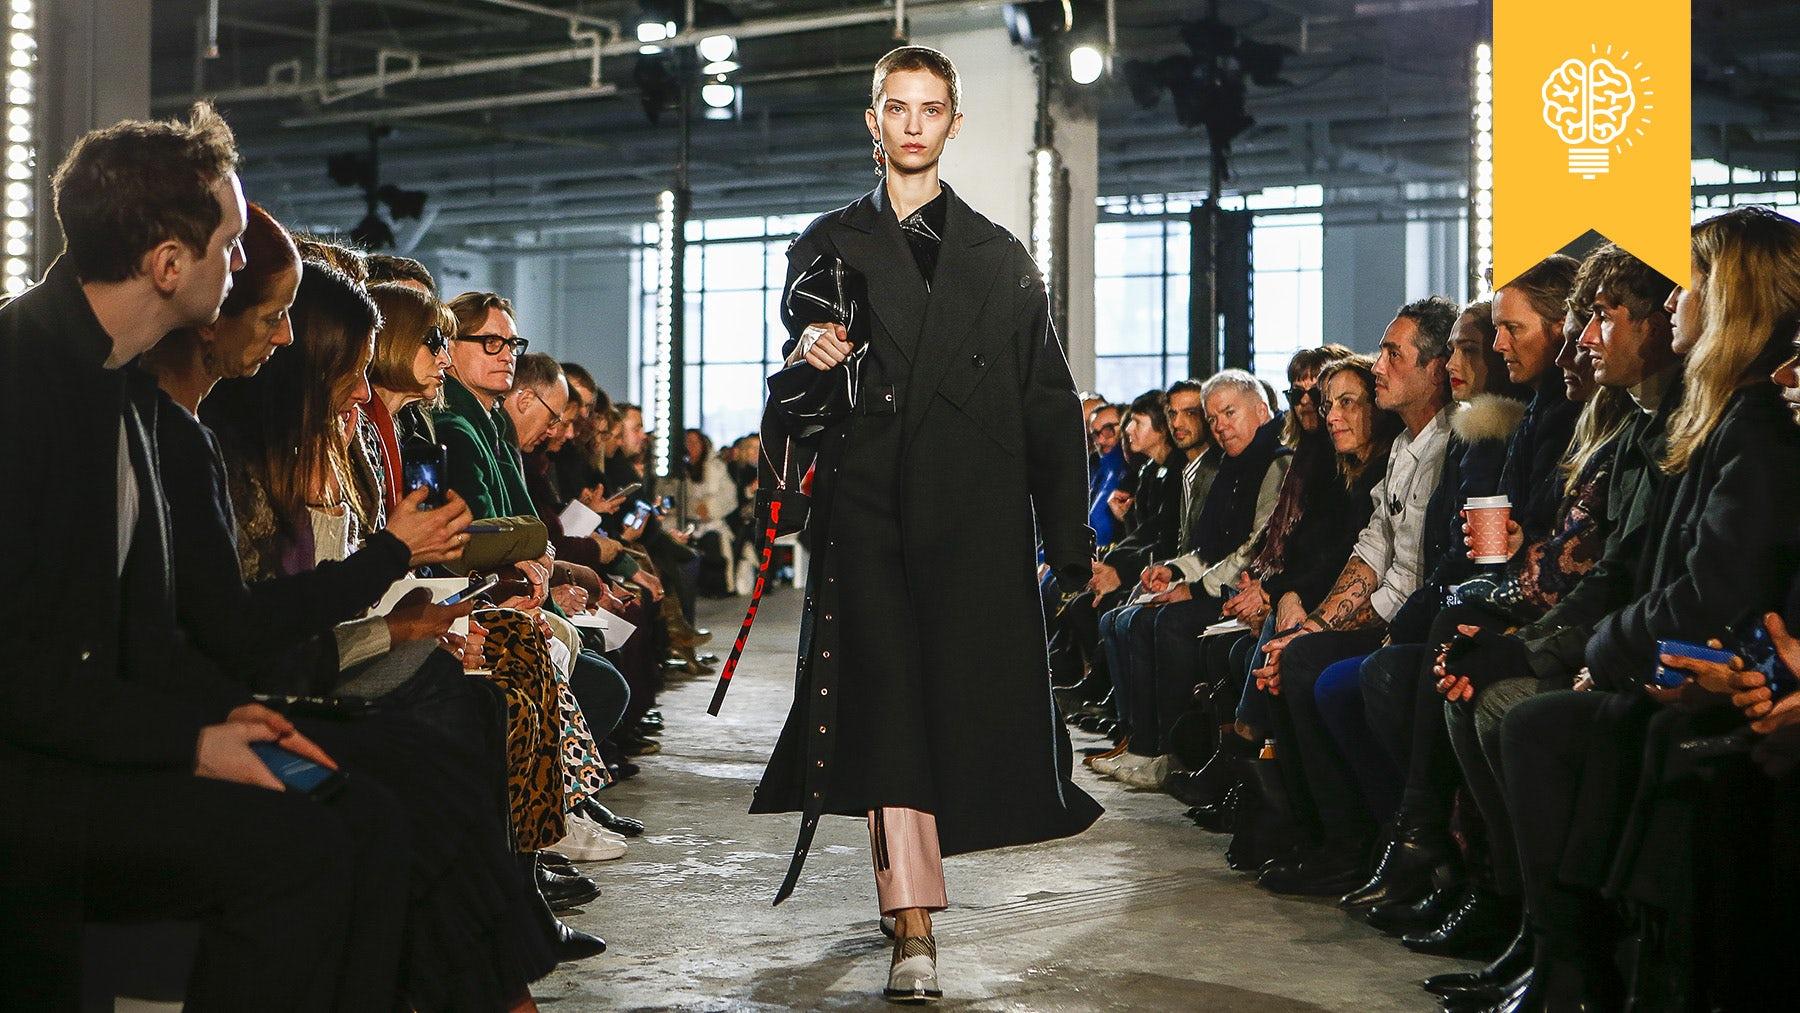 Proenza Schouler Autumn/Winter 2017 at New York Fashion Week | Source: Indigital